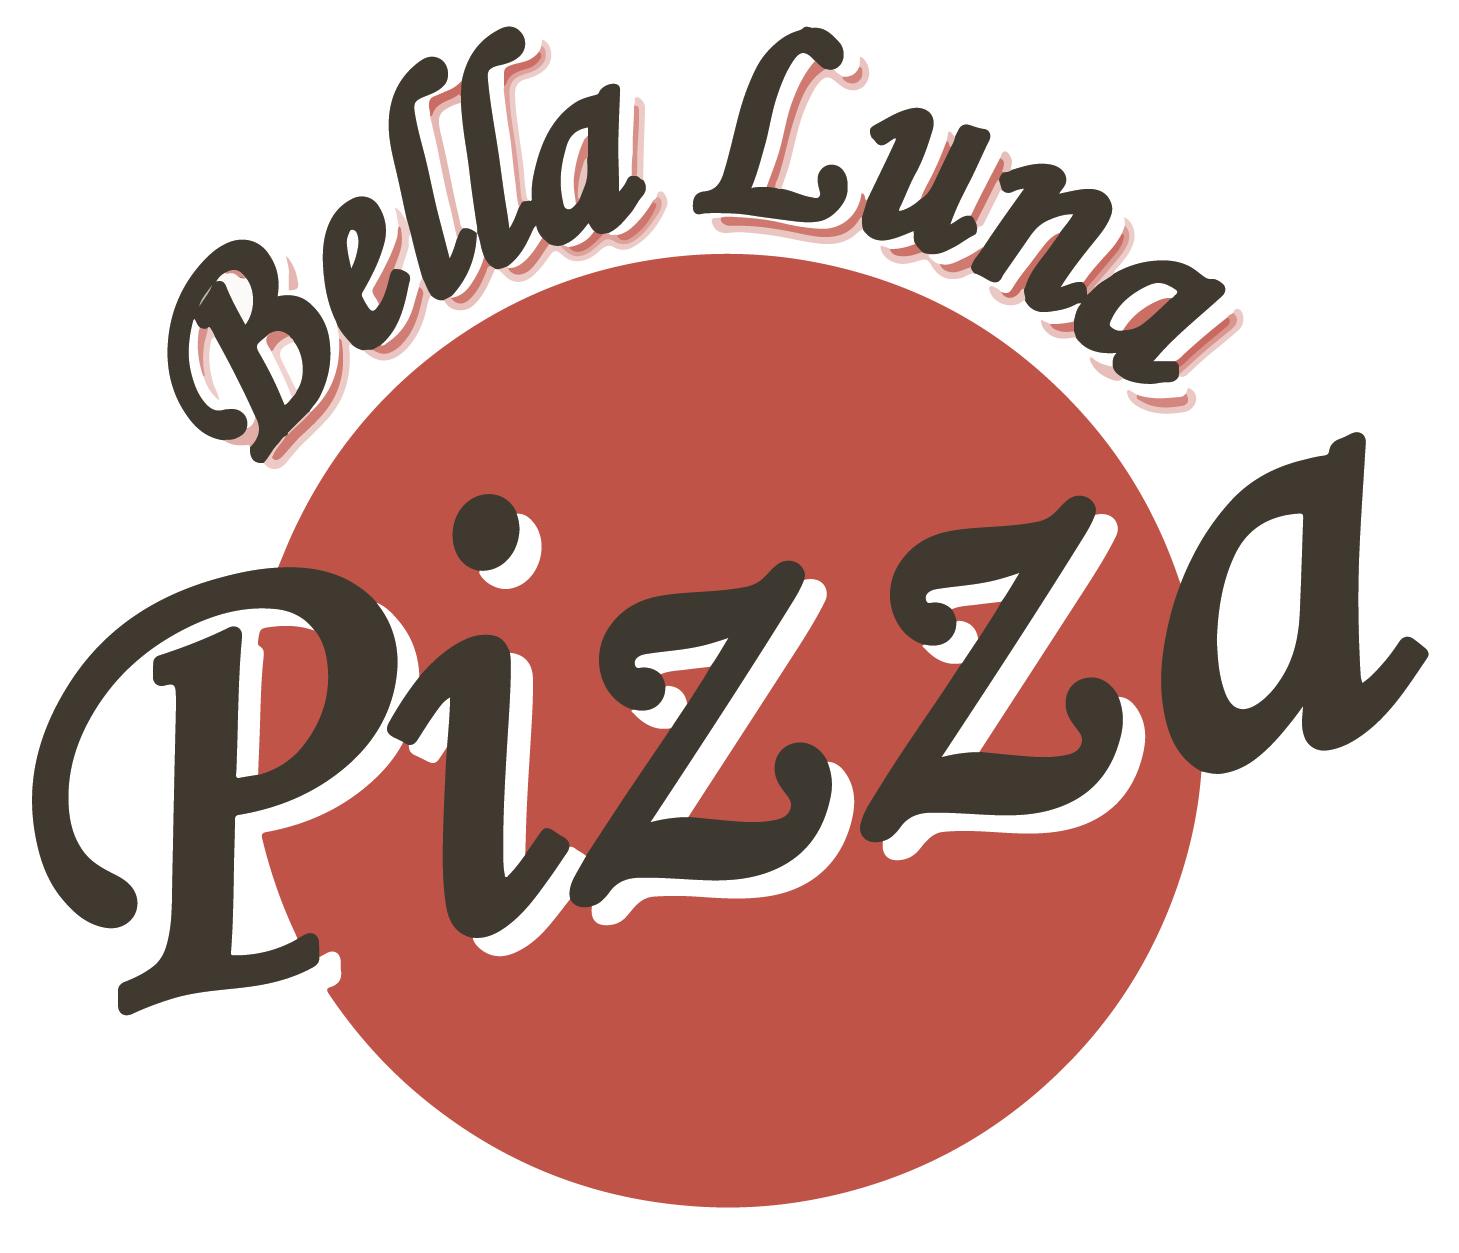 bl_pizzeria_logo.jpg